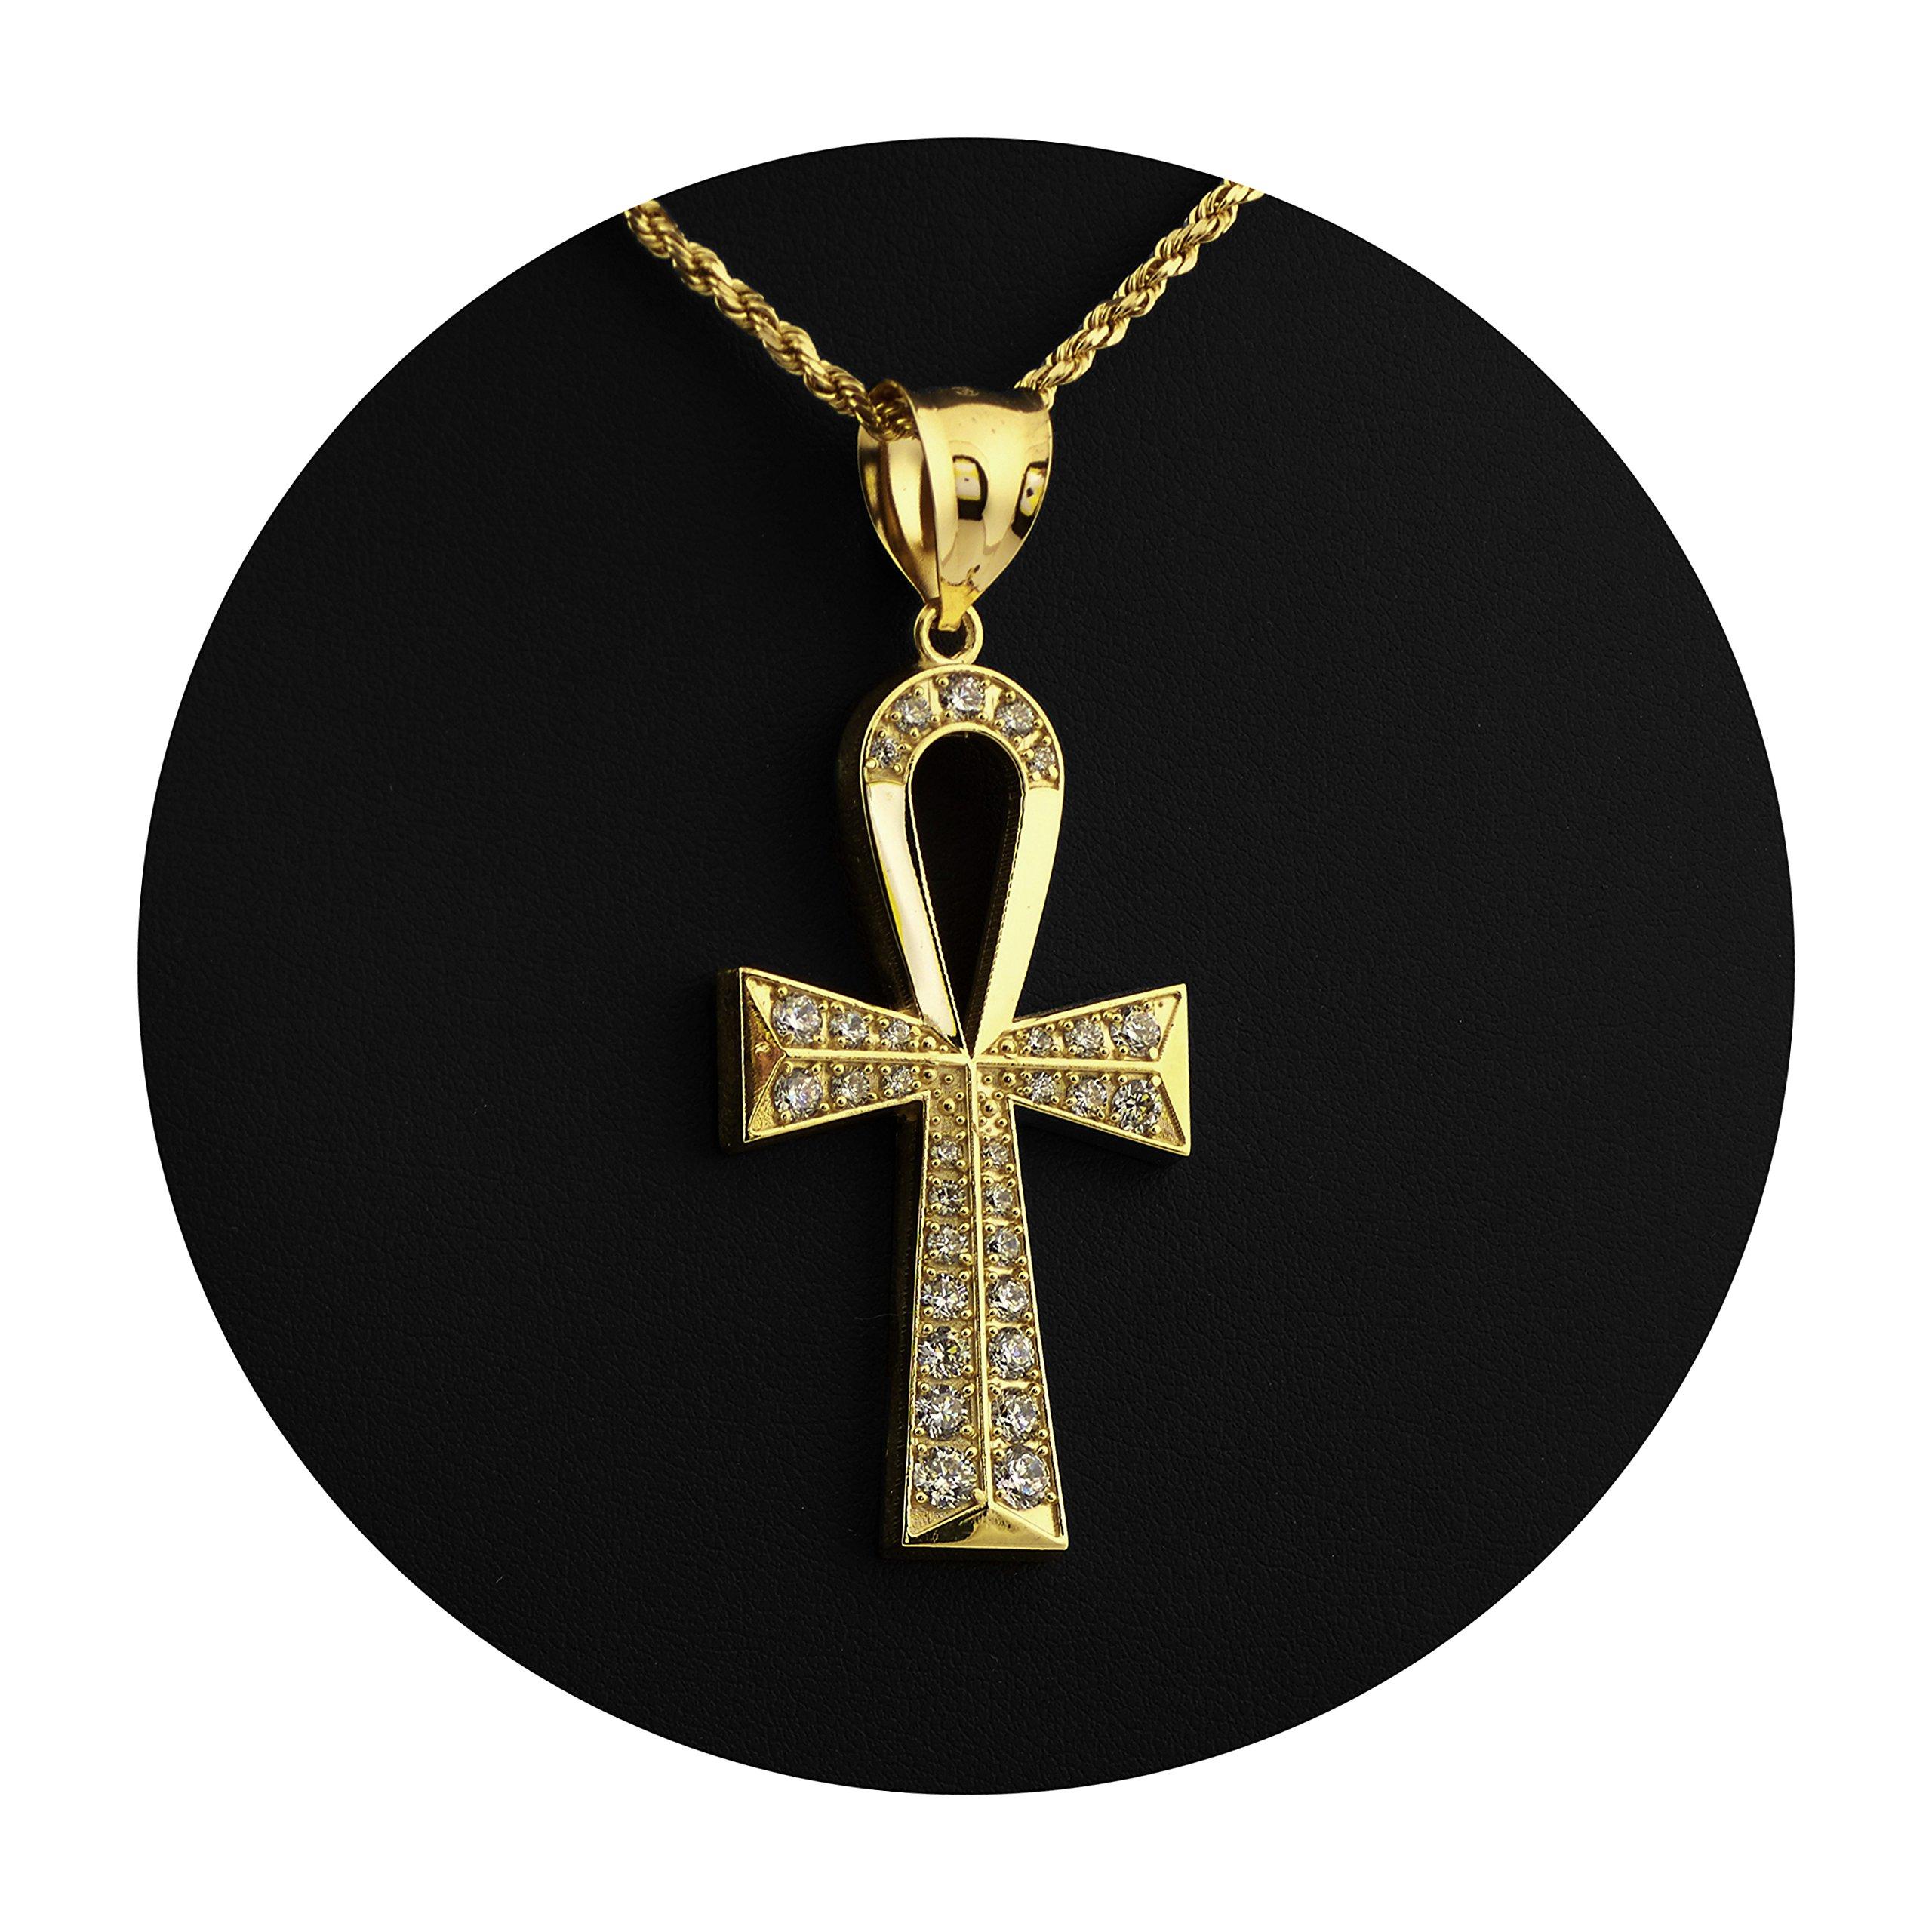 LoveBling 10K Yellow Gold Diamond Cut Ankh Cross Charm Necklace Pendant (2.5'' x 1.06'')